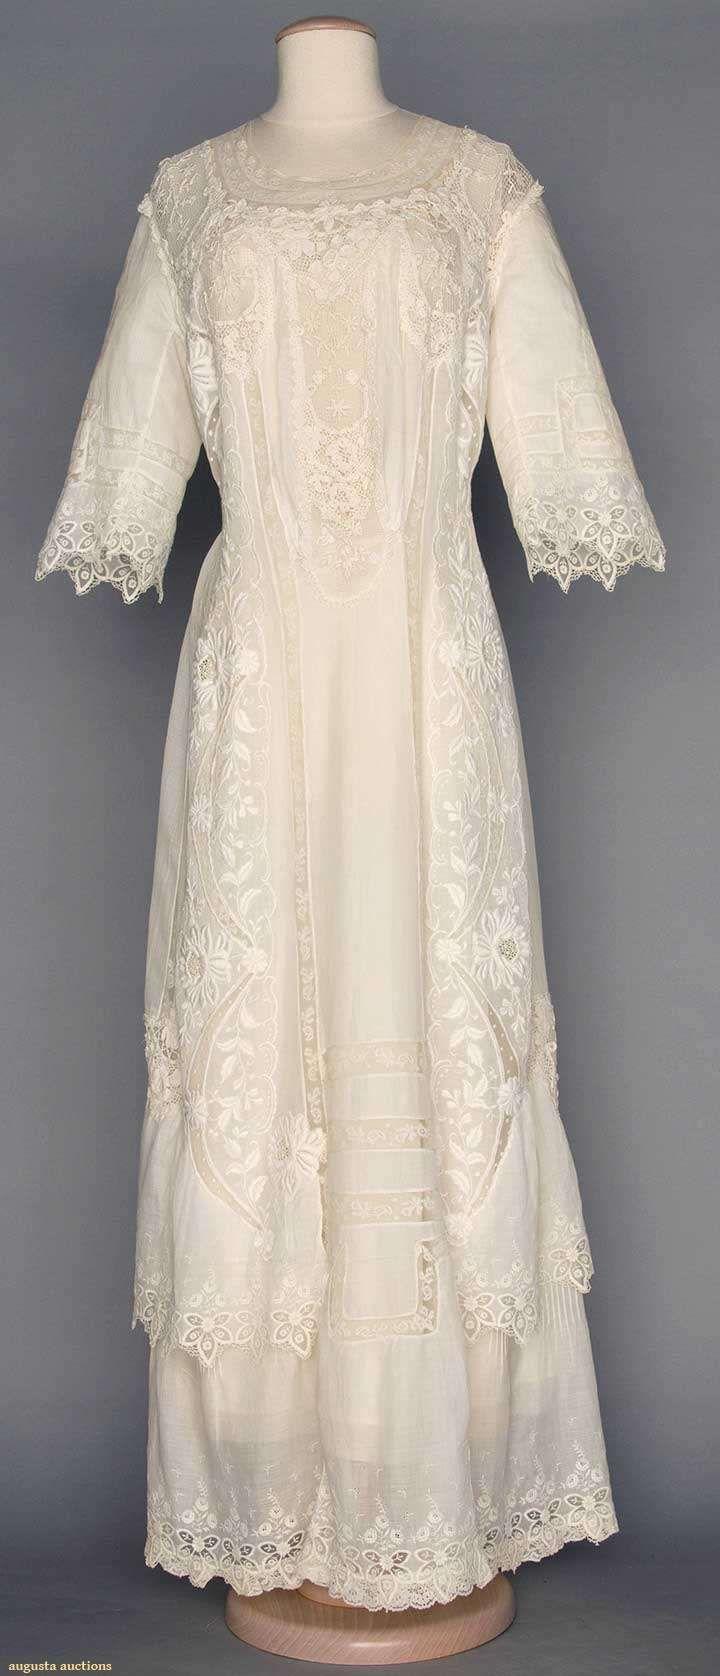 Lingerie Dress Fabrics & Colors